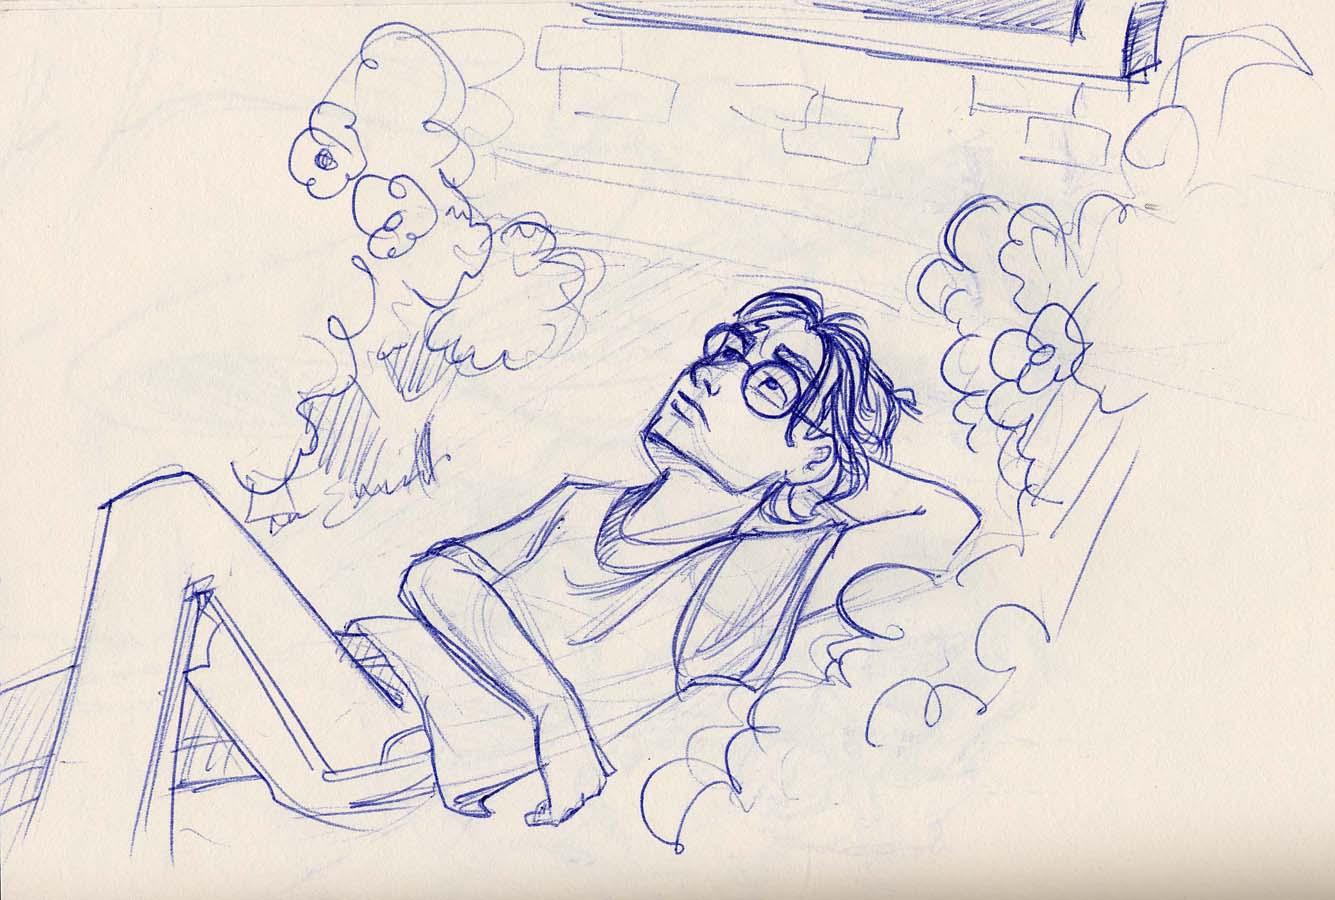 Harry eavesdrops the news outside the Dursleys' living room window